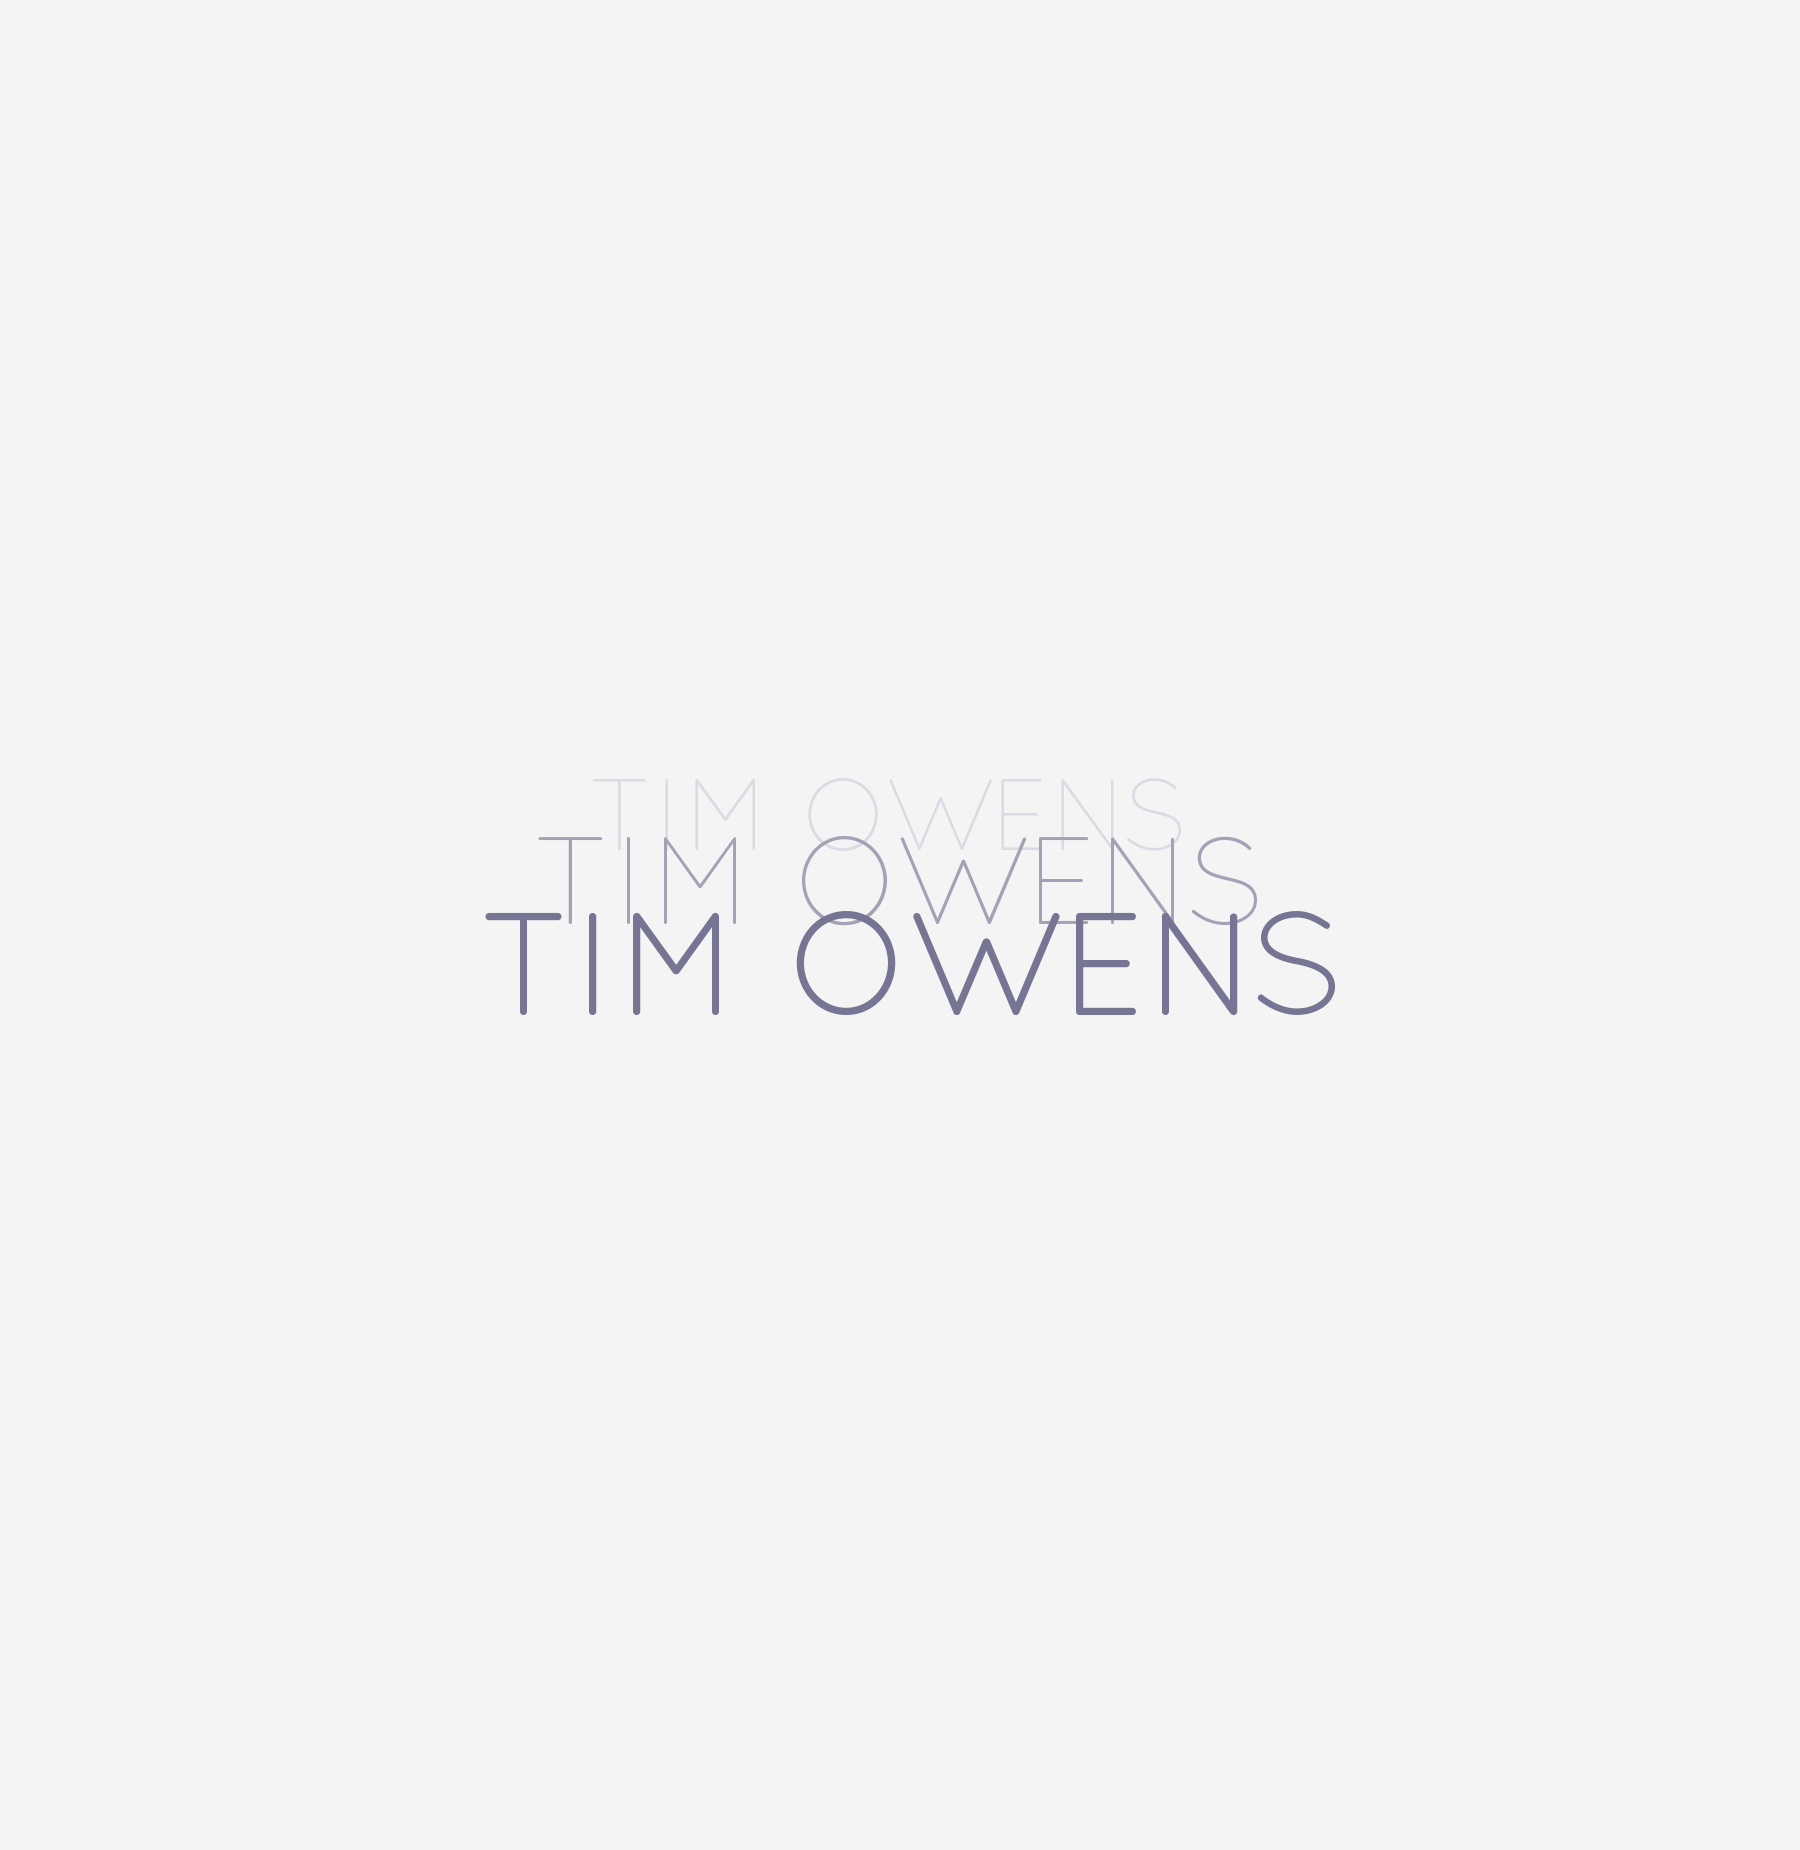 TimOwens_Logo.jpg